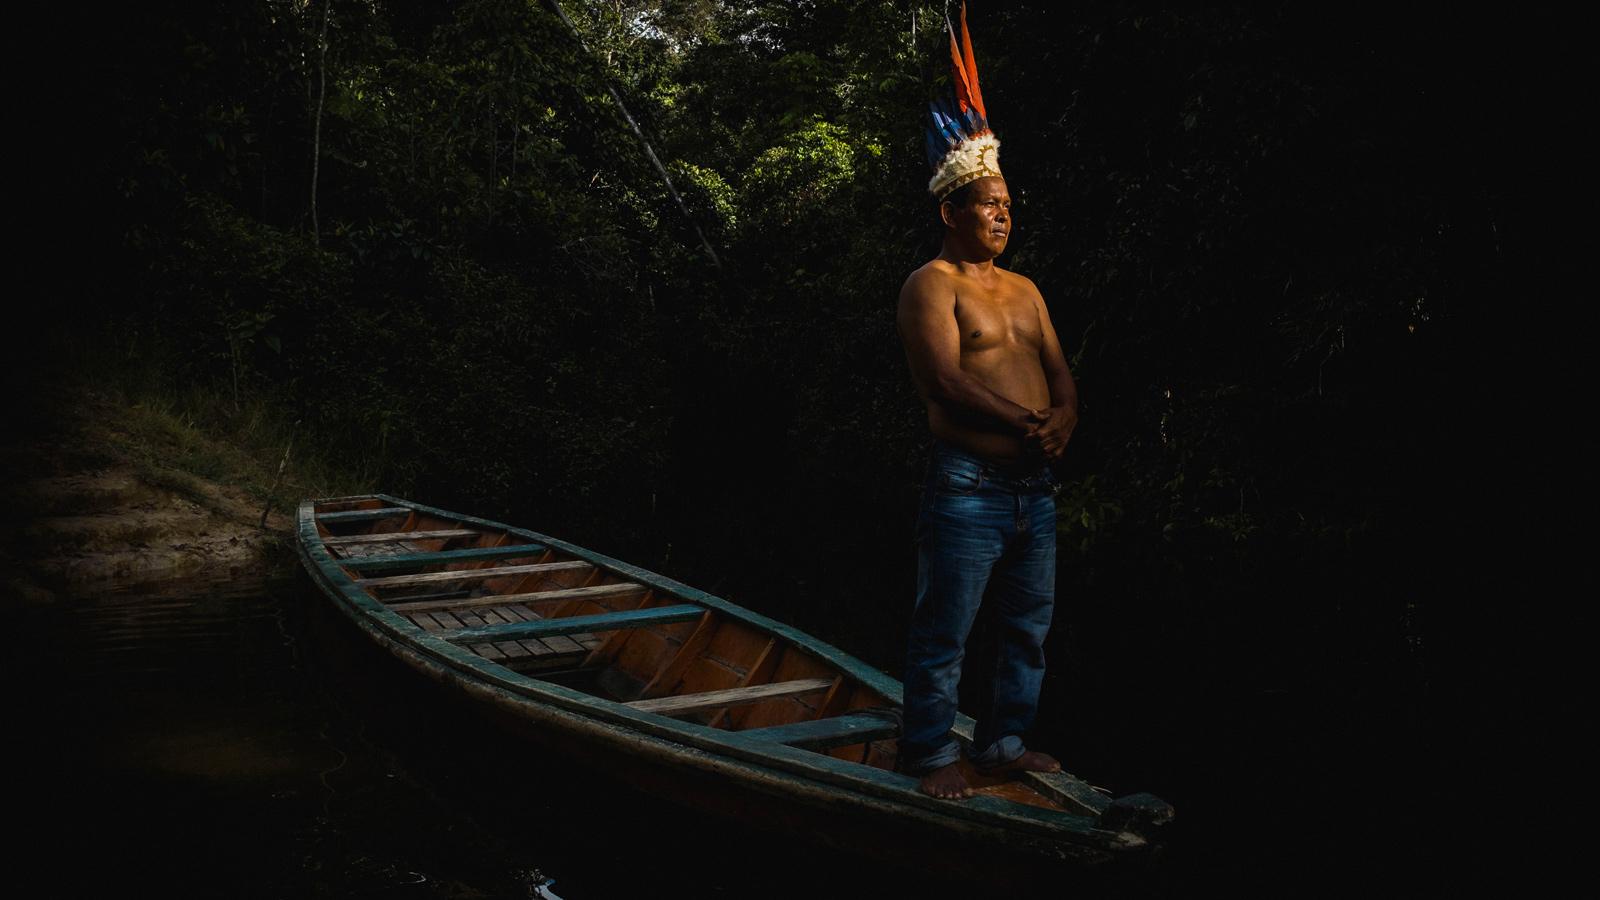 Revelados: ticunas en el lente de seis fotógrafos